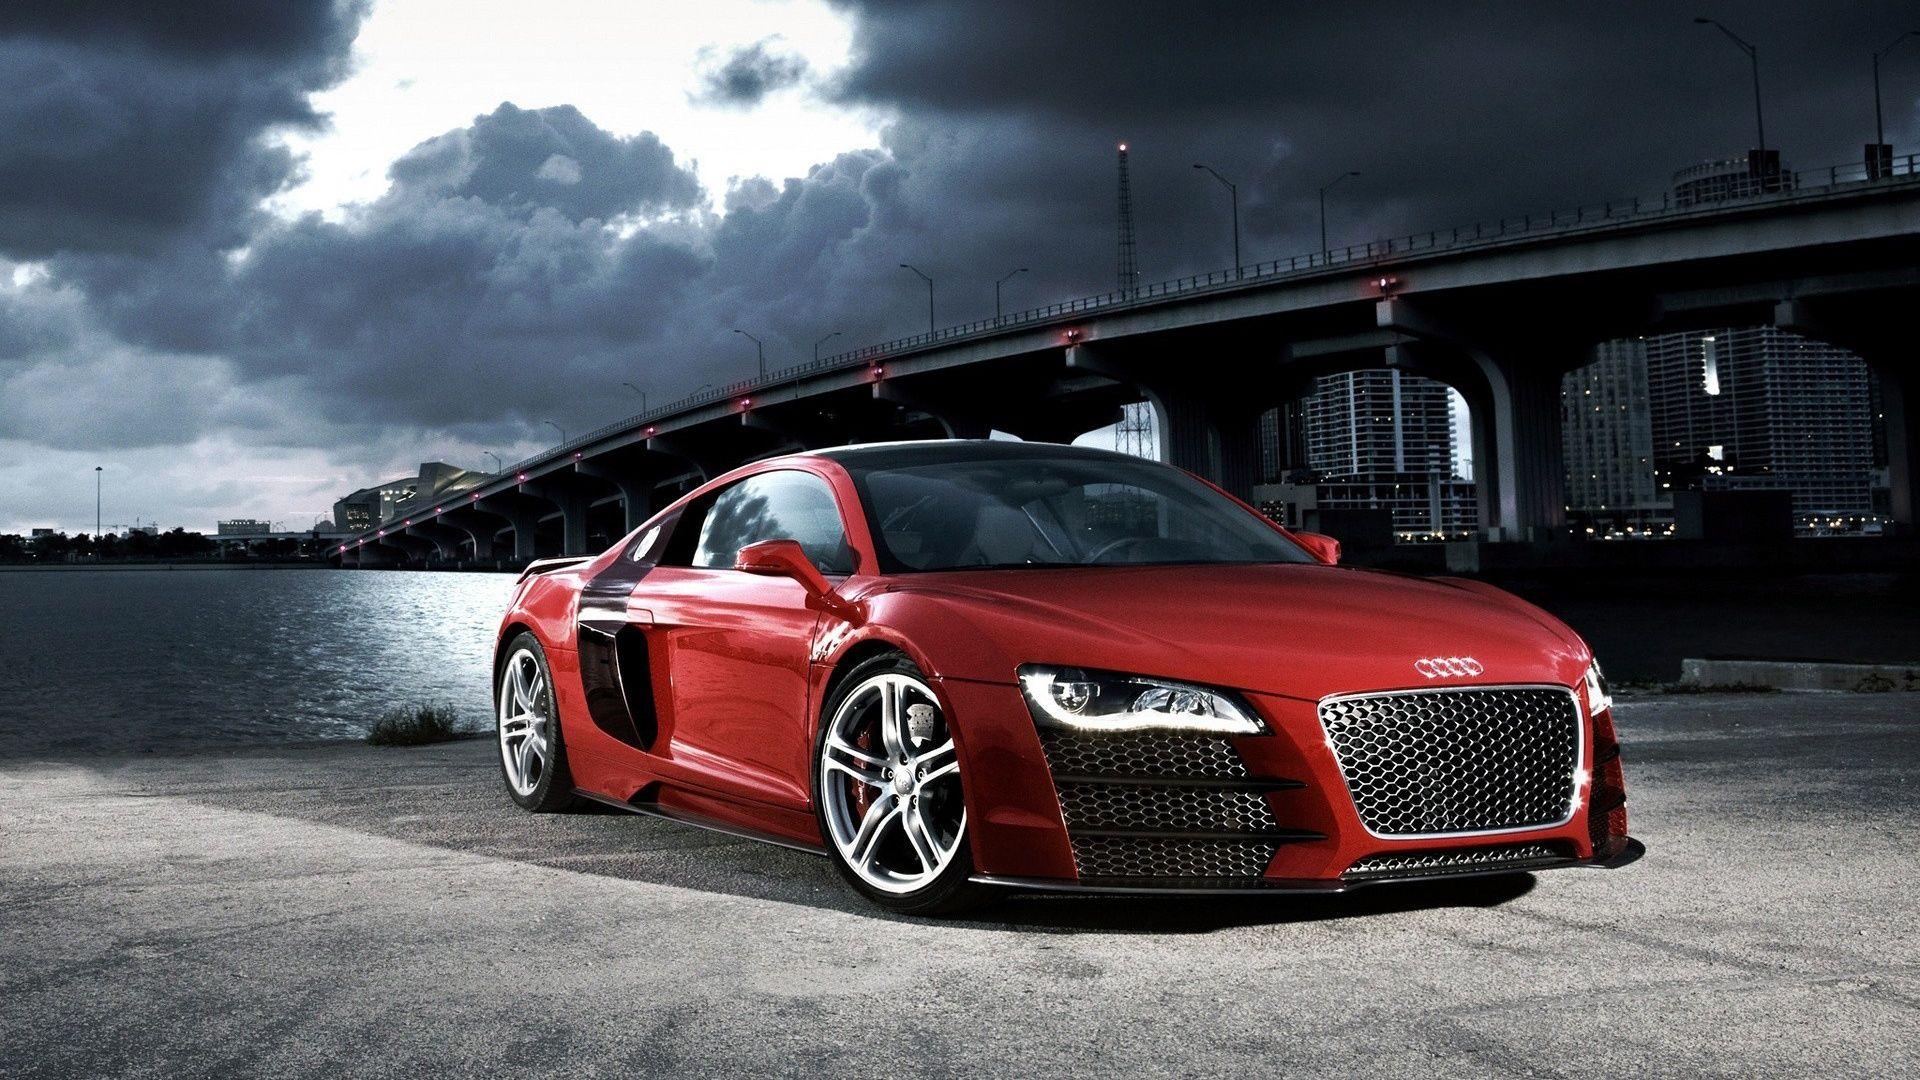 Hd wallpaper vehicle - Hd Car Wallpapers 1080p